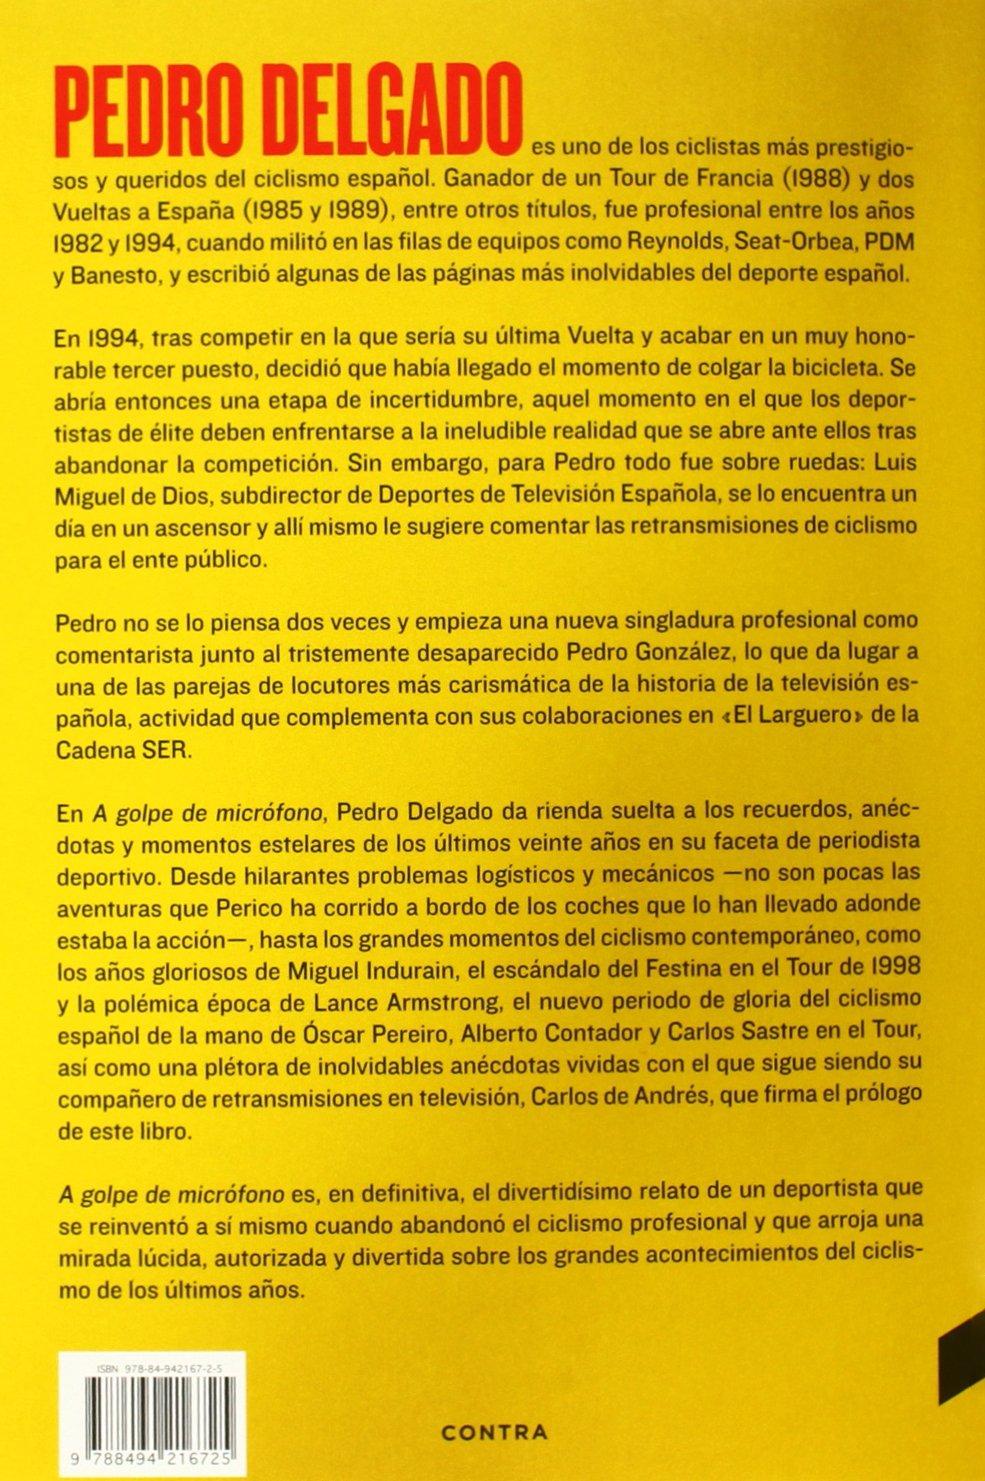 A golpe de micrófono : las peripecias de un ciclista de élite reconvertido en periodista deportivo: Pedro Delgado Robledo: 9788494216725: Amazon.com: Books